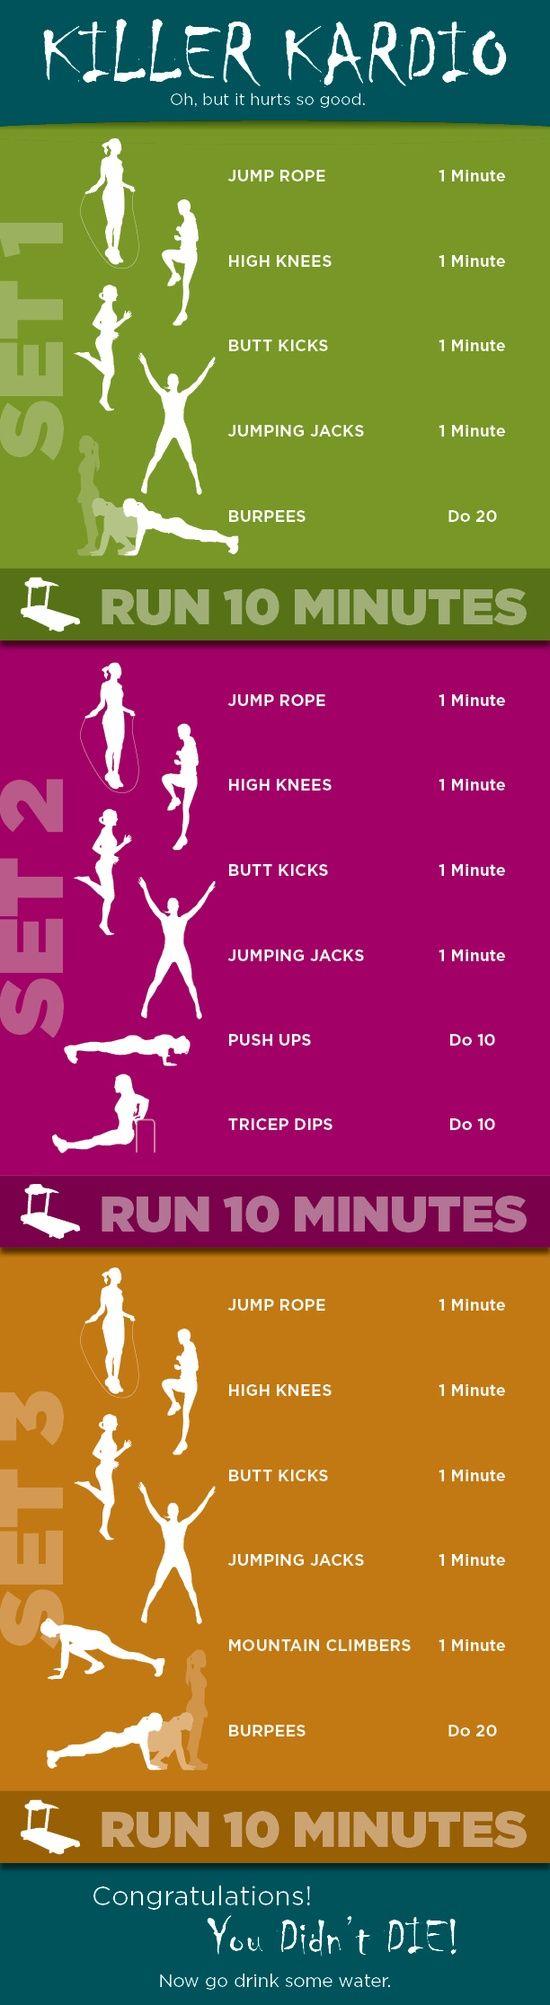 inspire-my-workout-killer-kardio